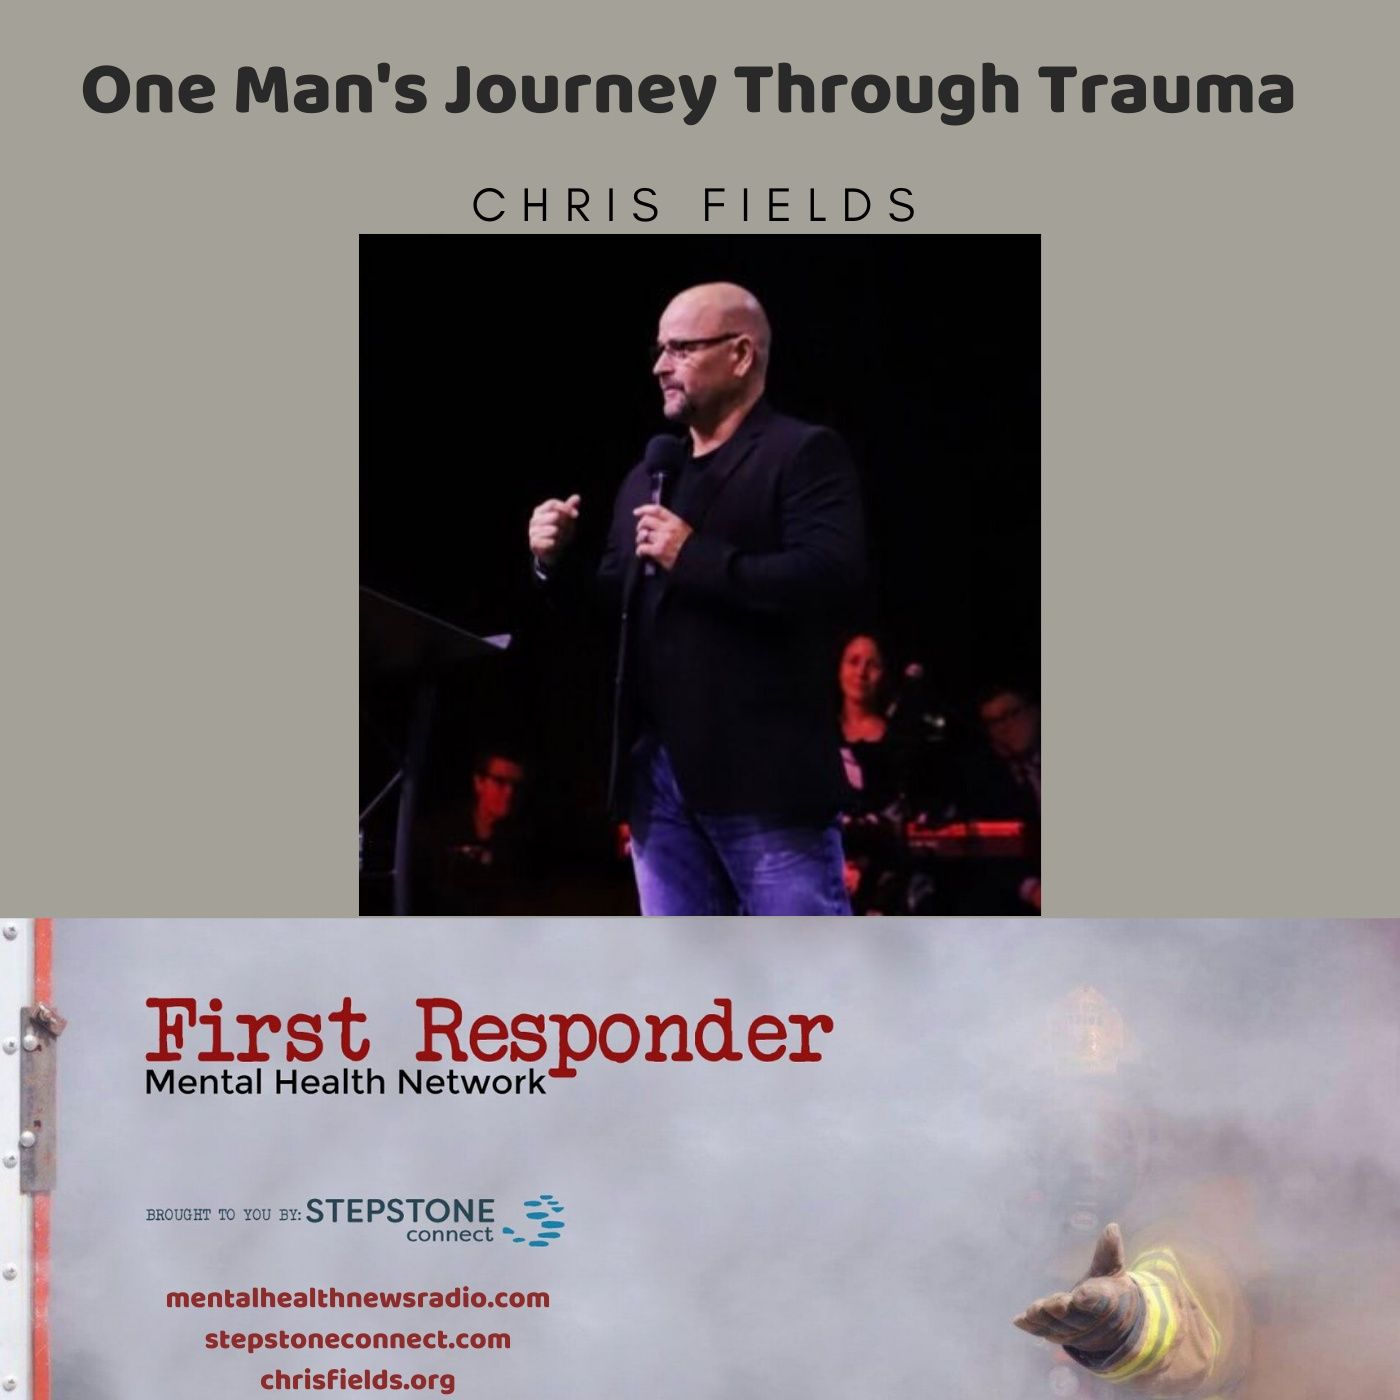 Mental Health News Radio - One Man's Journey Through Trauma with Chris Fields